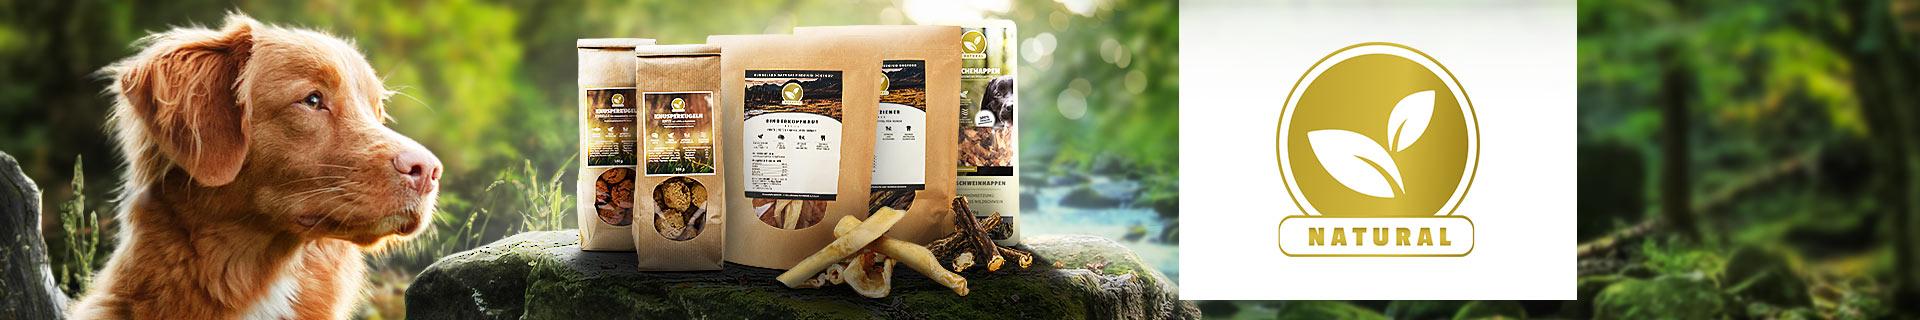 Natural Hundesnacks